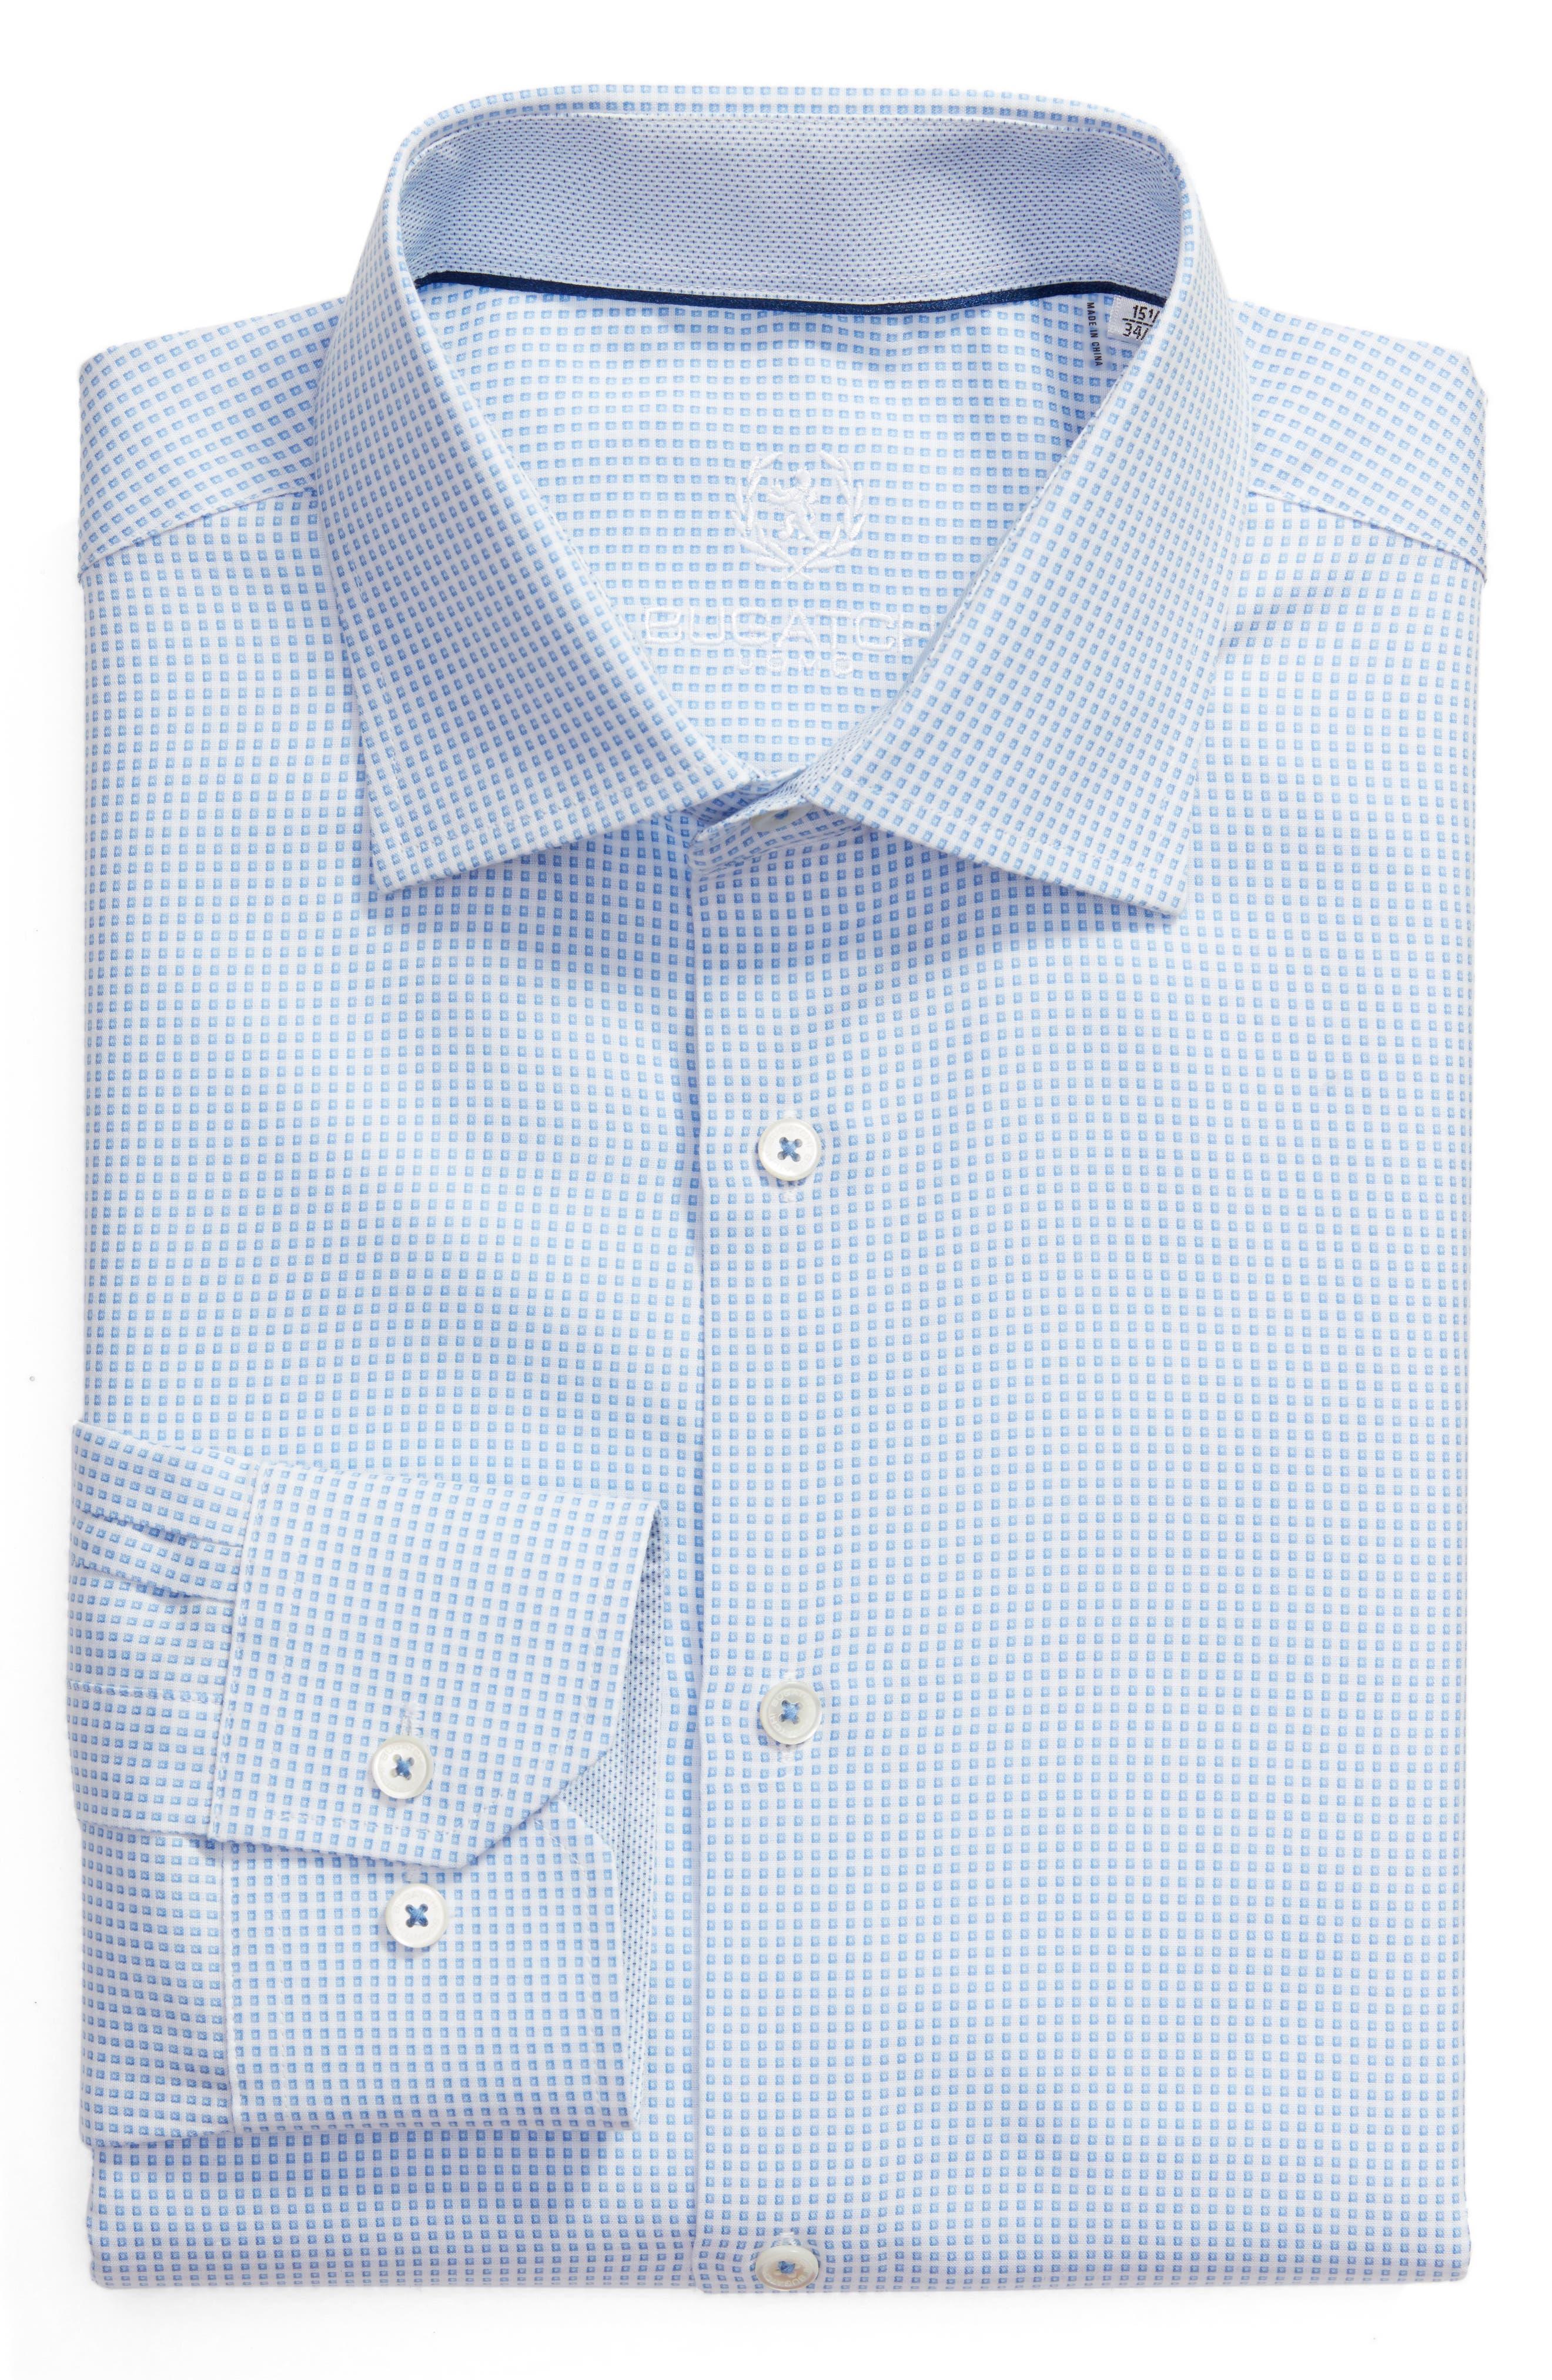 Bugatchi Trim Fit Dobby Check Dress Shirt